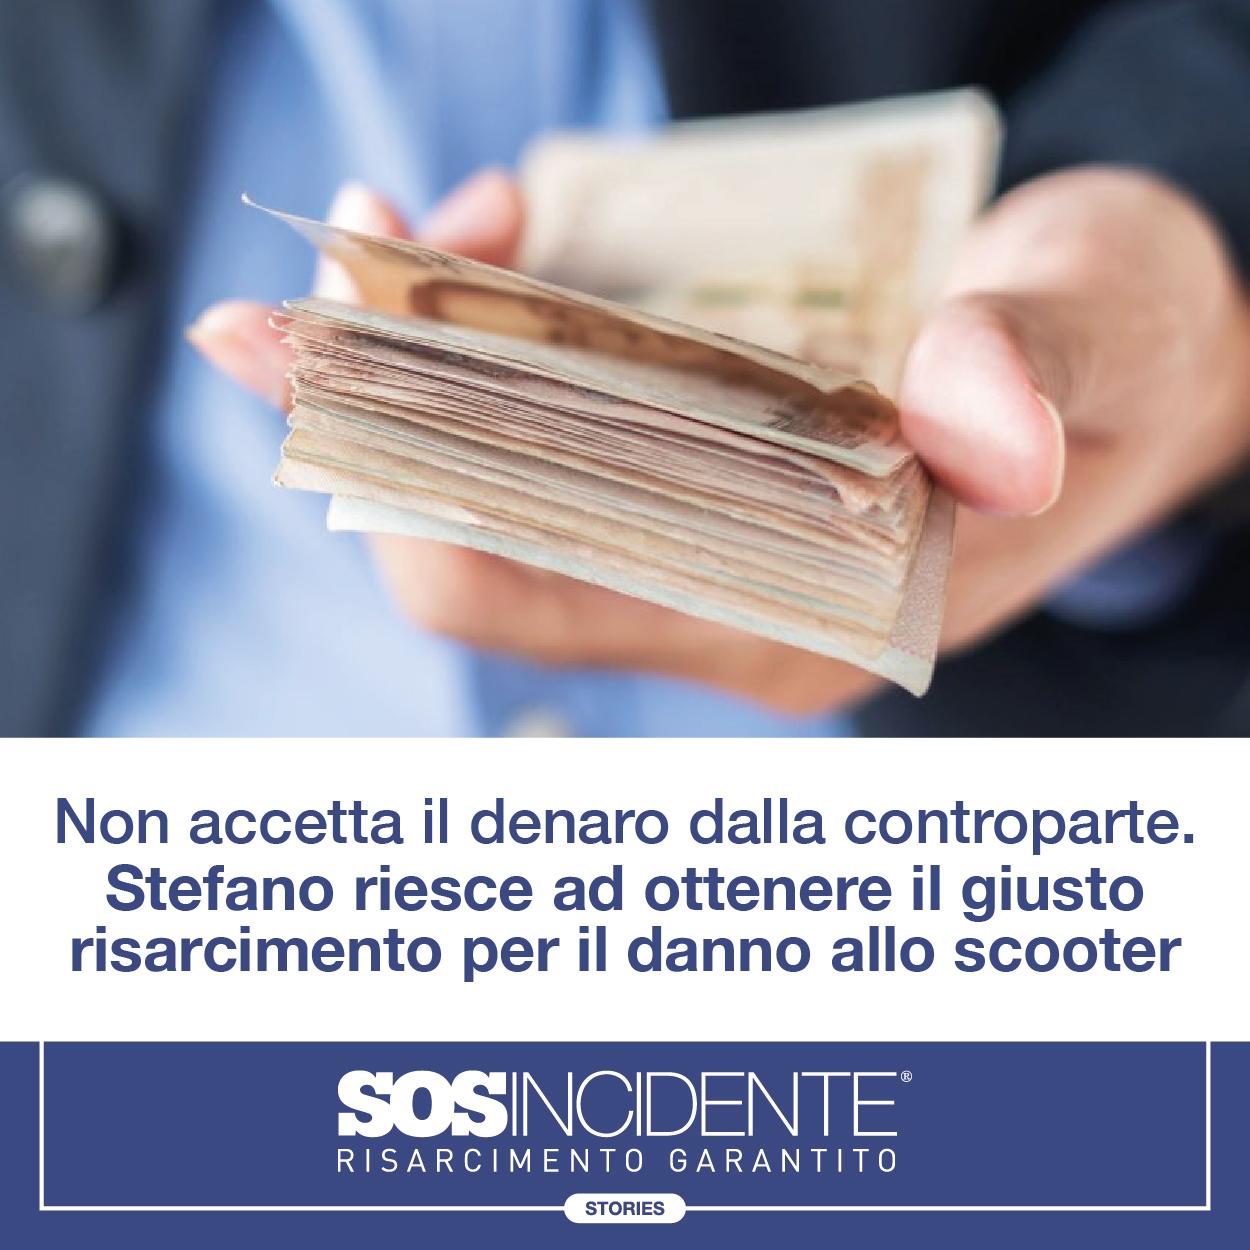 SOSIncidente_Soldi_Controparte